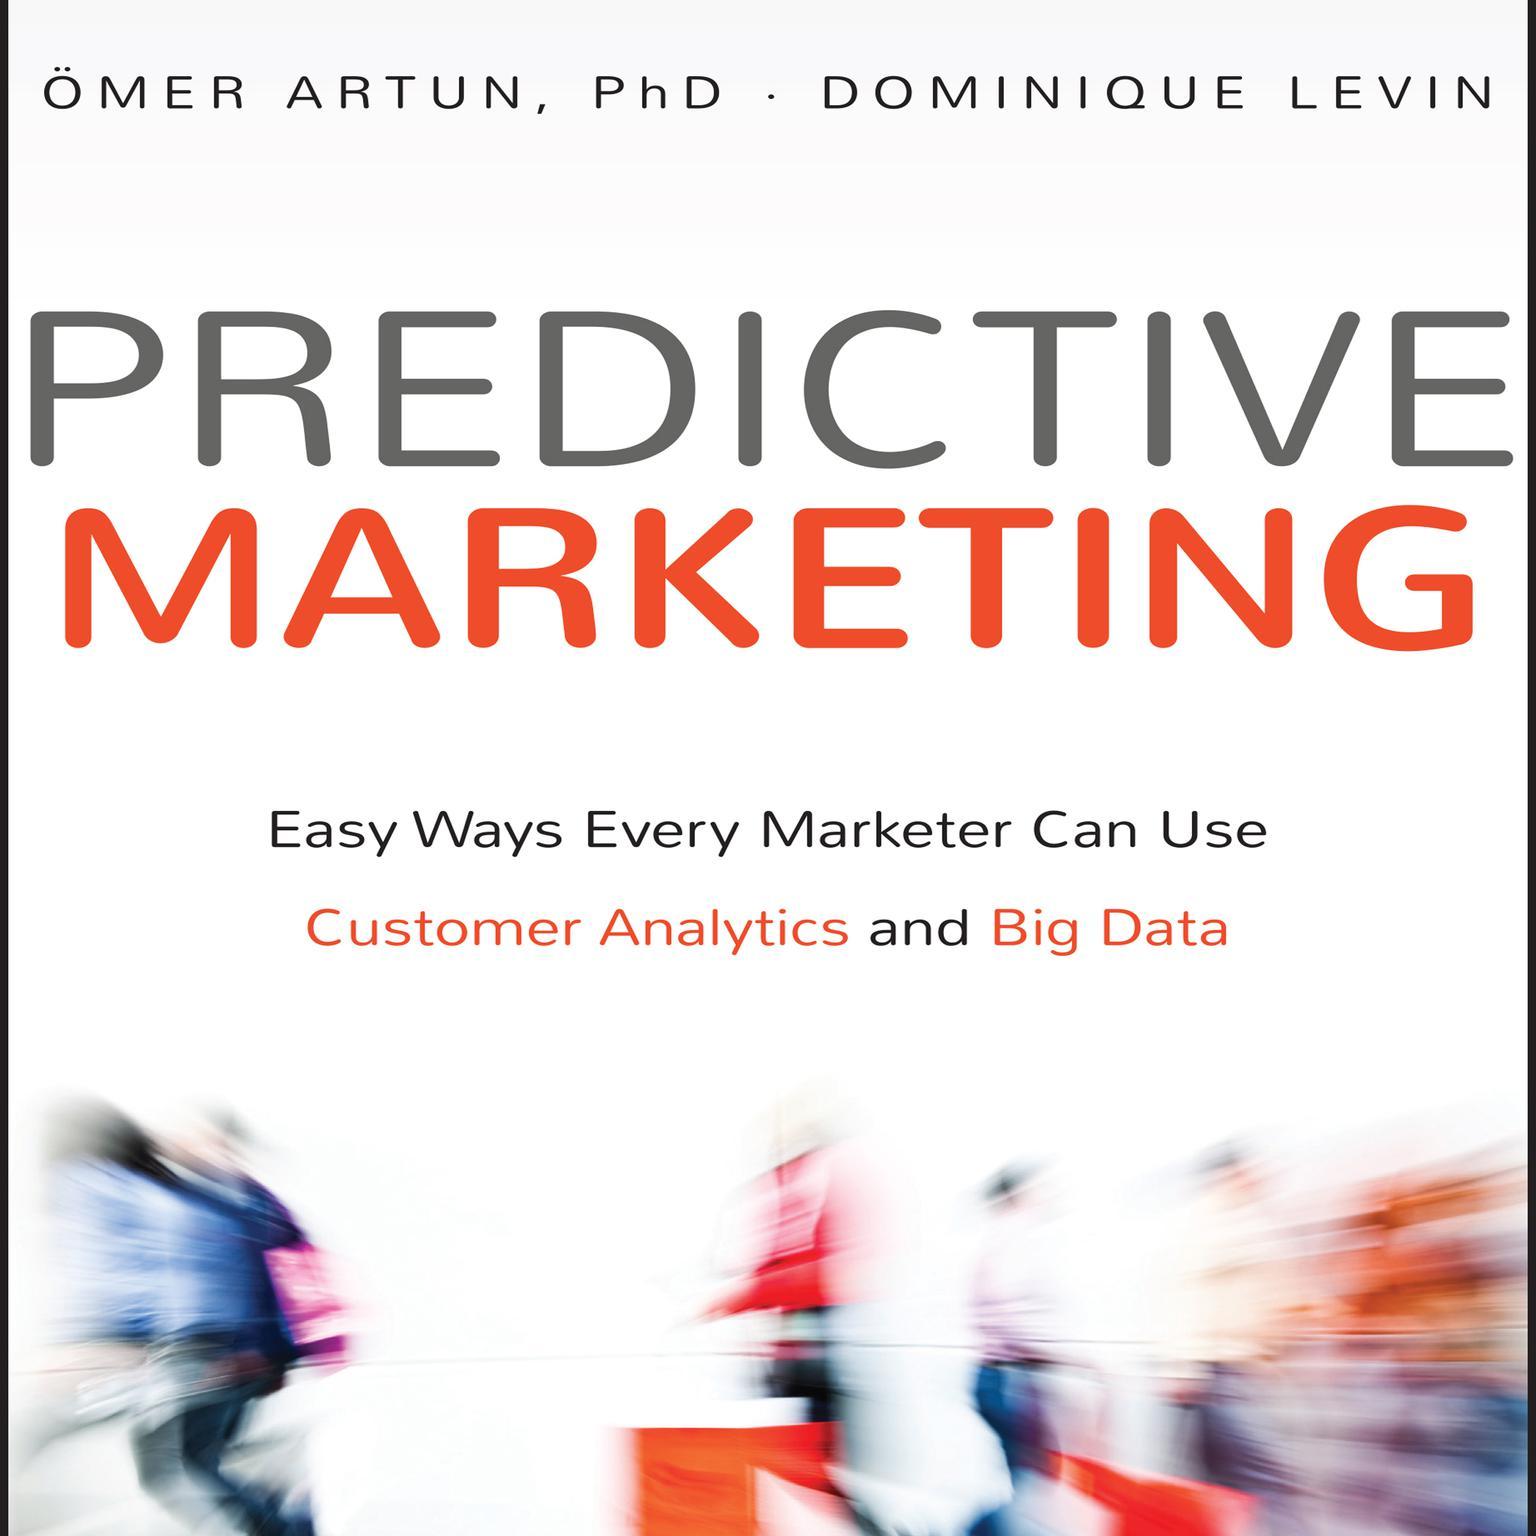 Predictive Marketing: Easy Ways Every Marketer Can Use Customer Analytics and Big Data Audiobook, by Ömer Artun